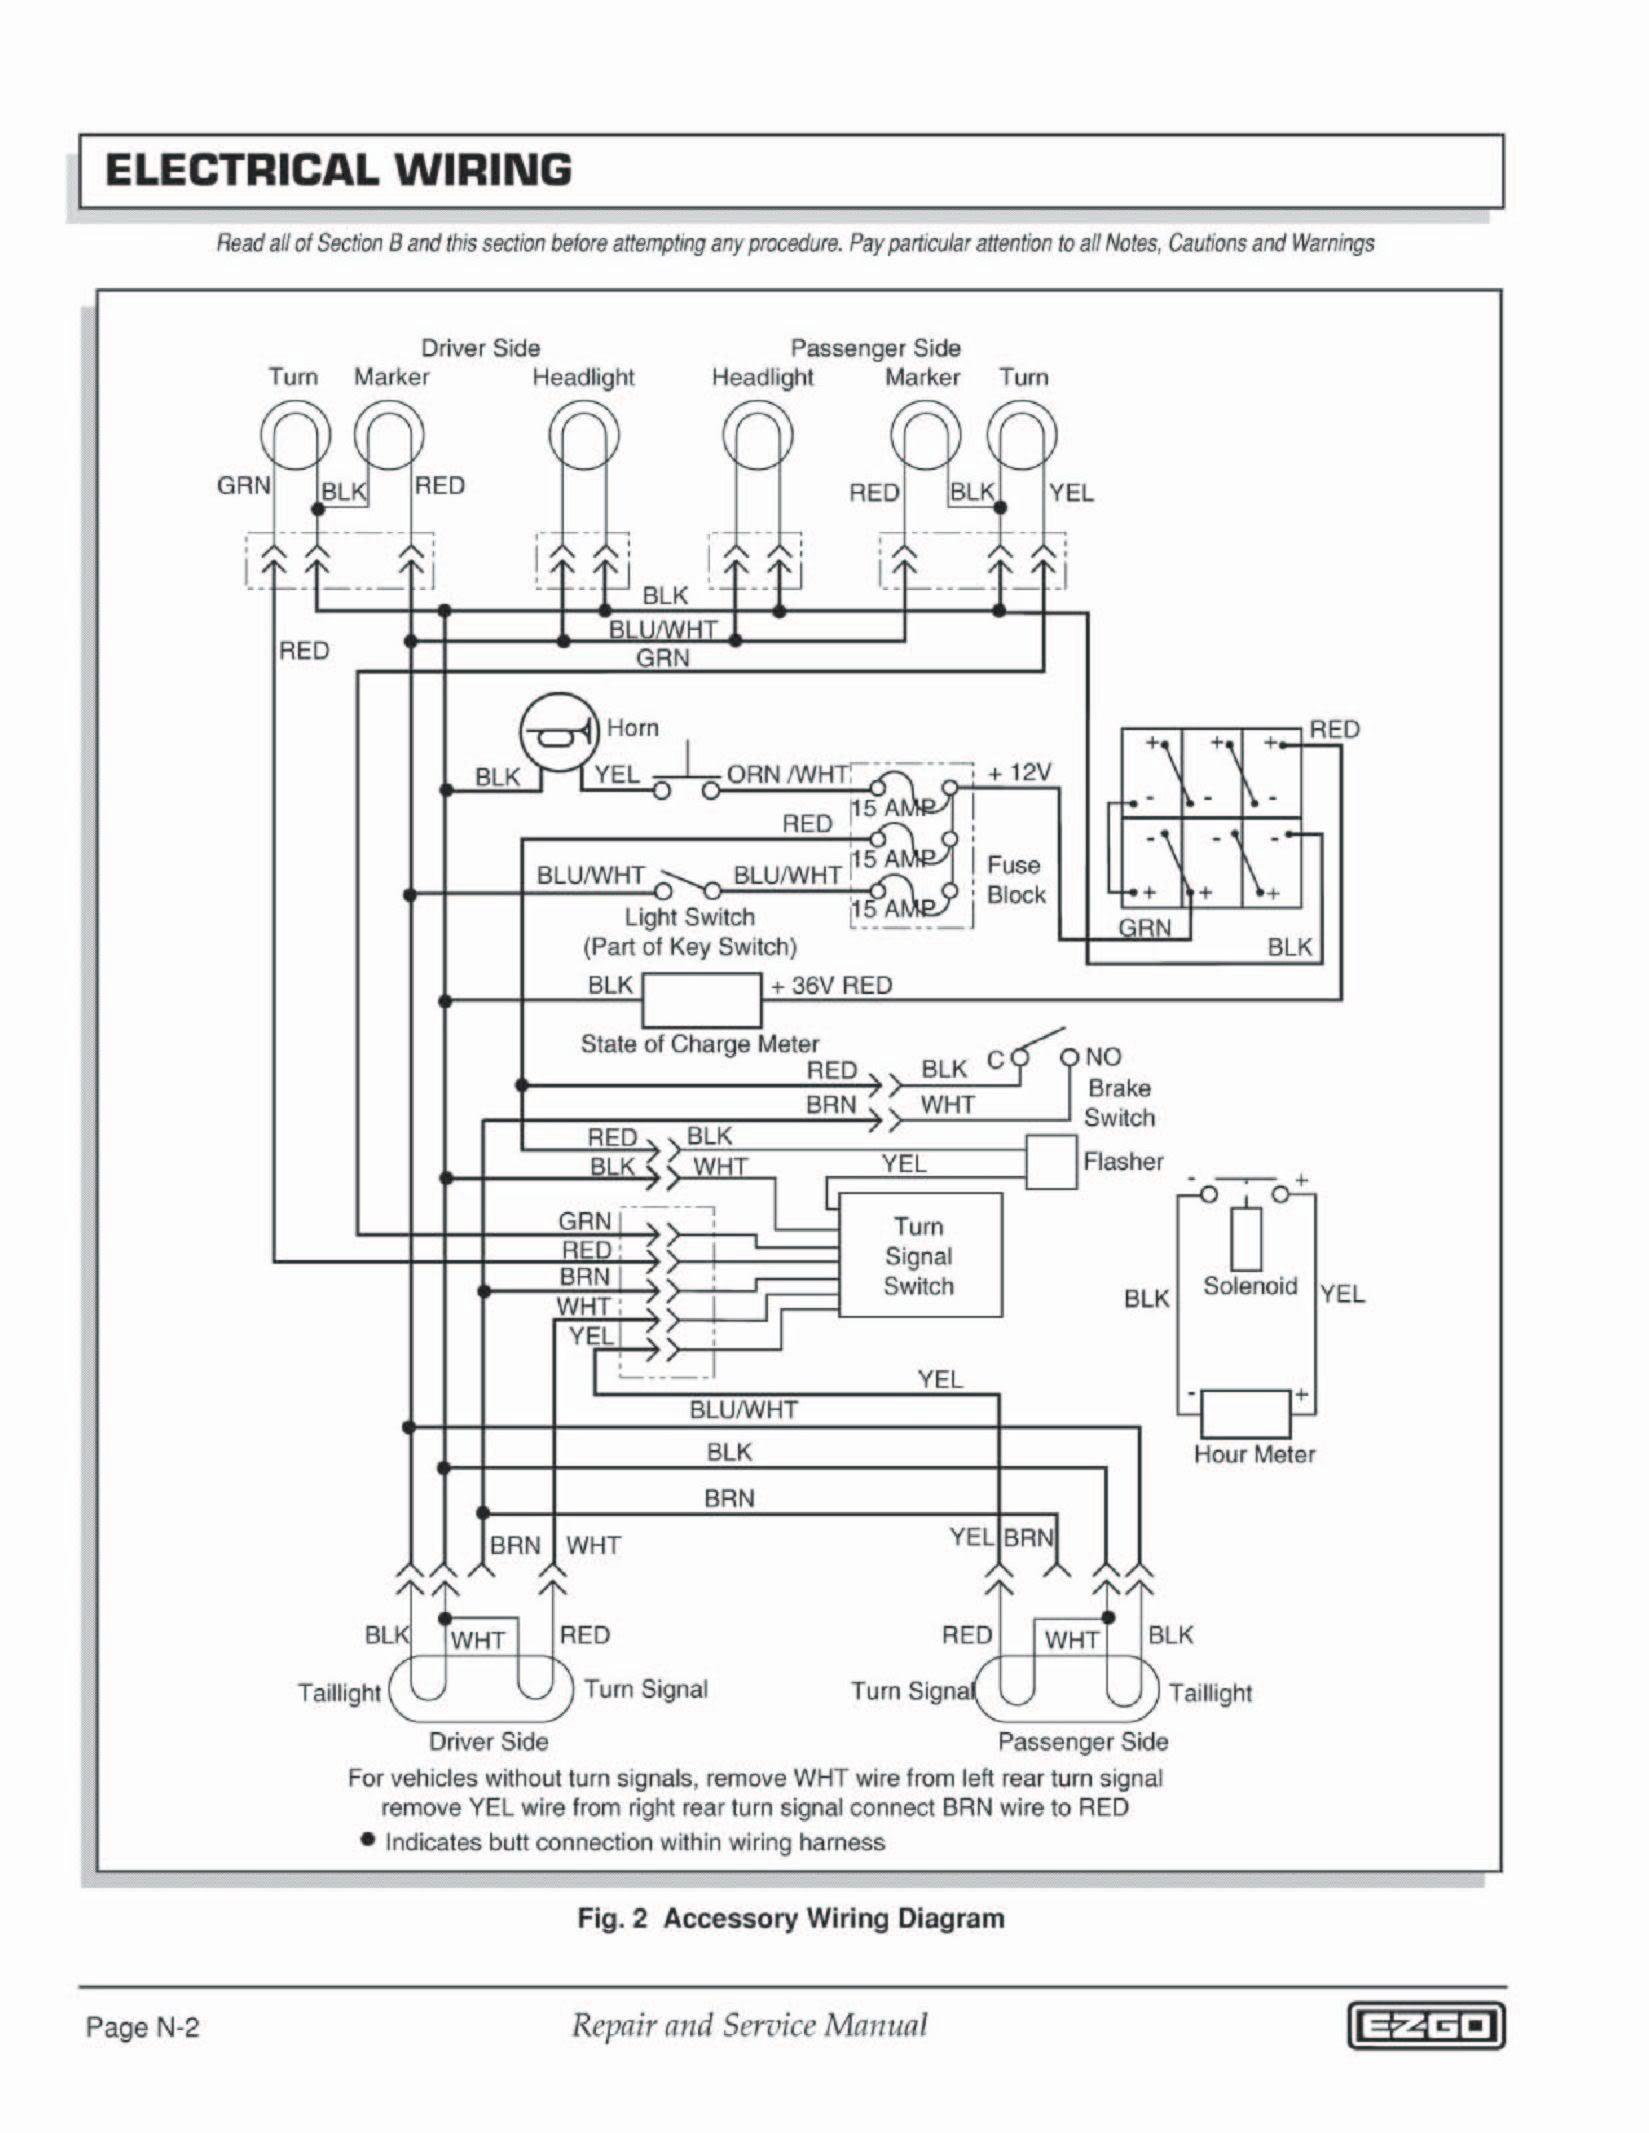 ezgo txt wiring diagram 48 - tucked 240sx fuse box for wiring diagram  schematics  wiring diagram schematics